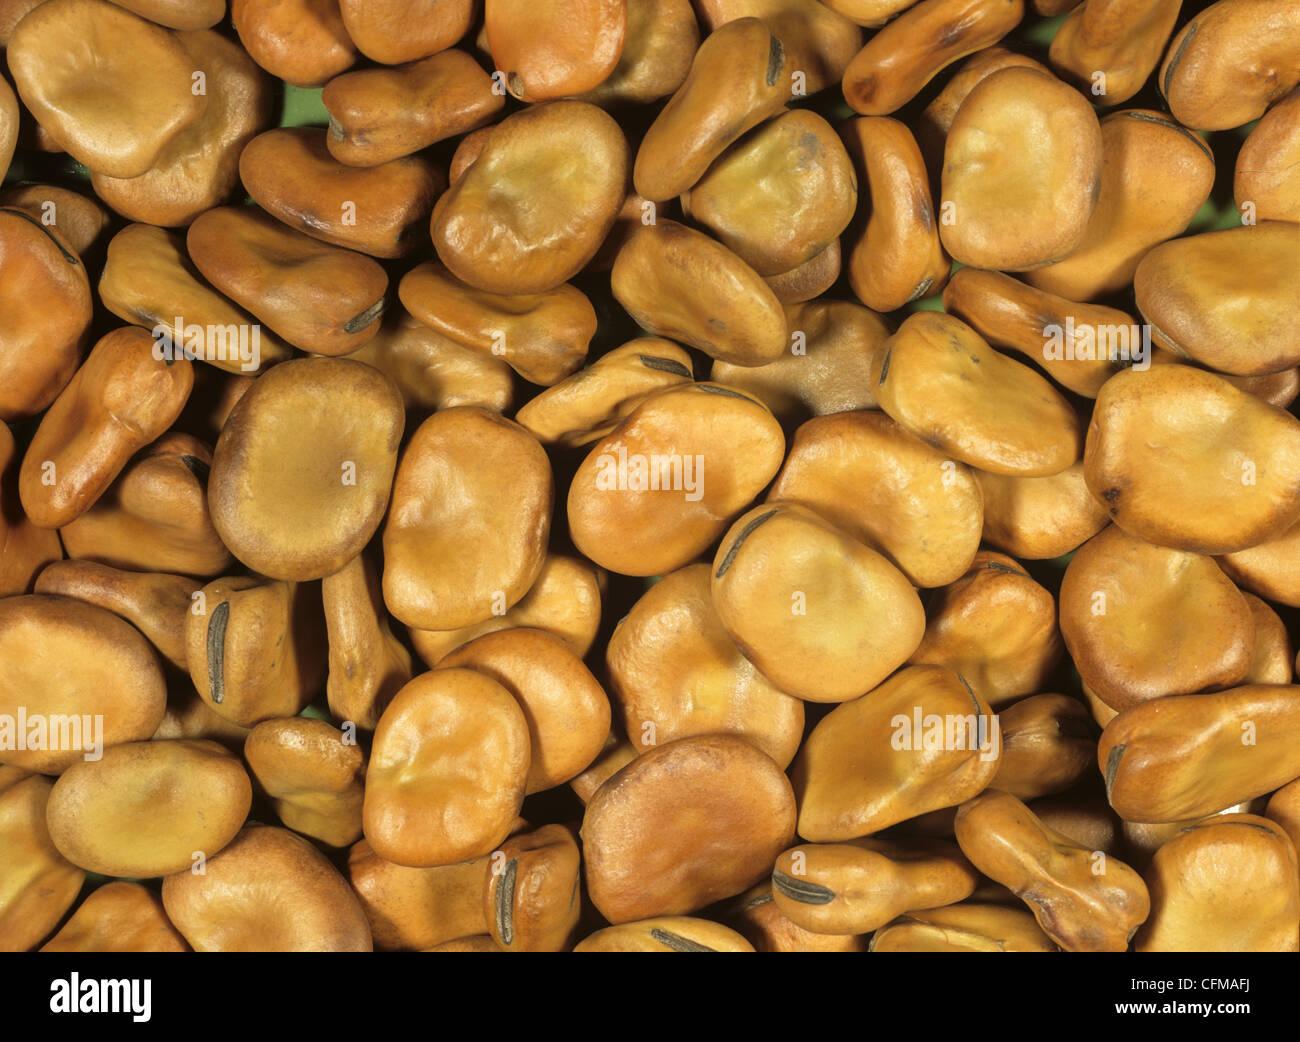 Broad bean seeds (Vicia faba) - Stock Image